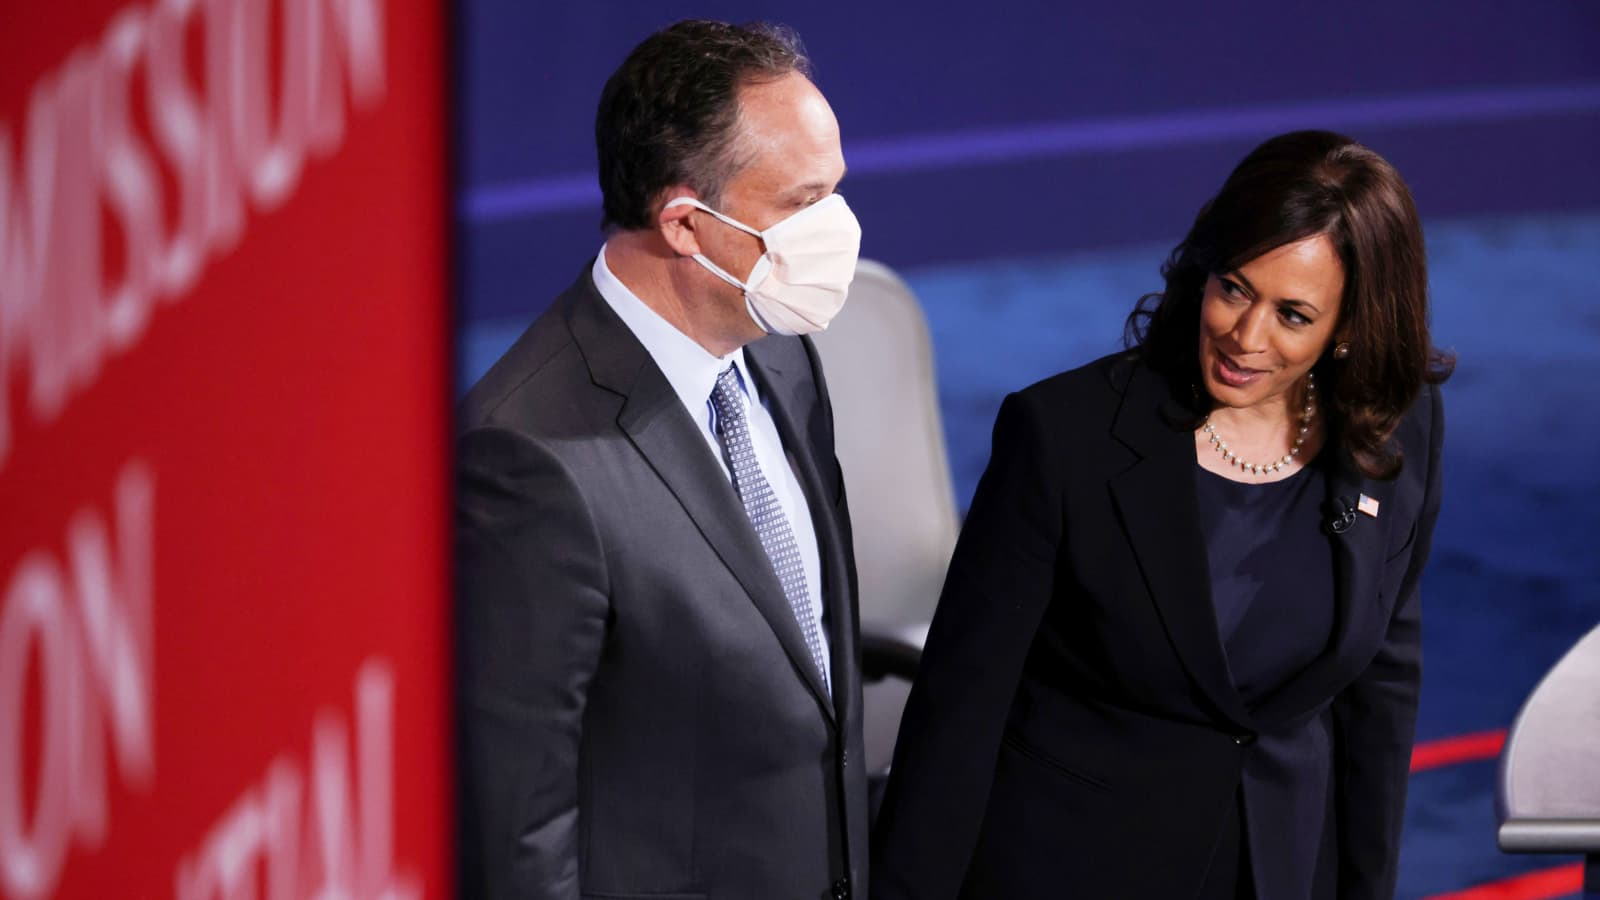 Coronavirus: Joe Biden and Kamala Harris evaluate travel after Covid  positives for 3 others